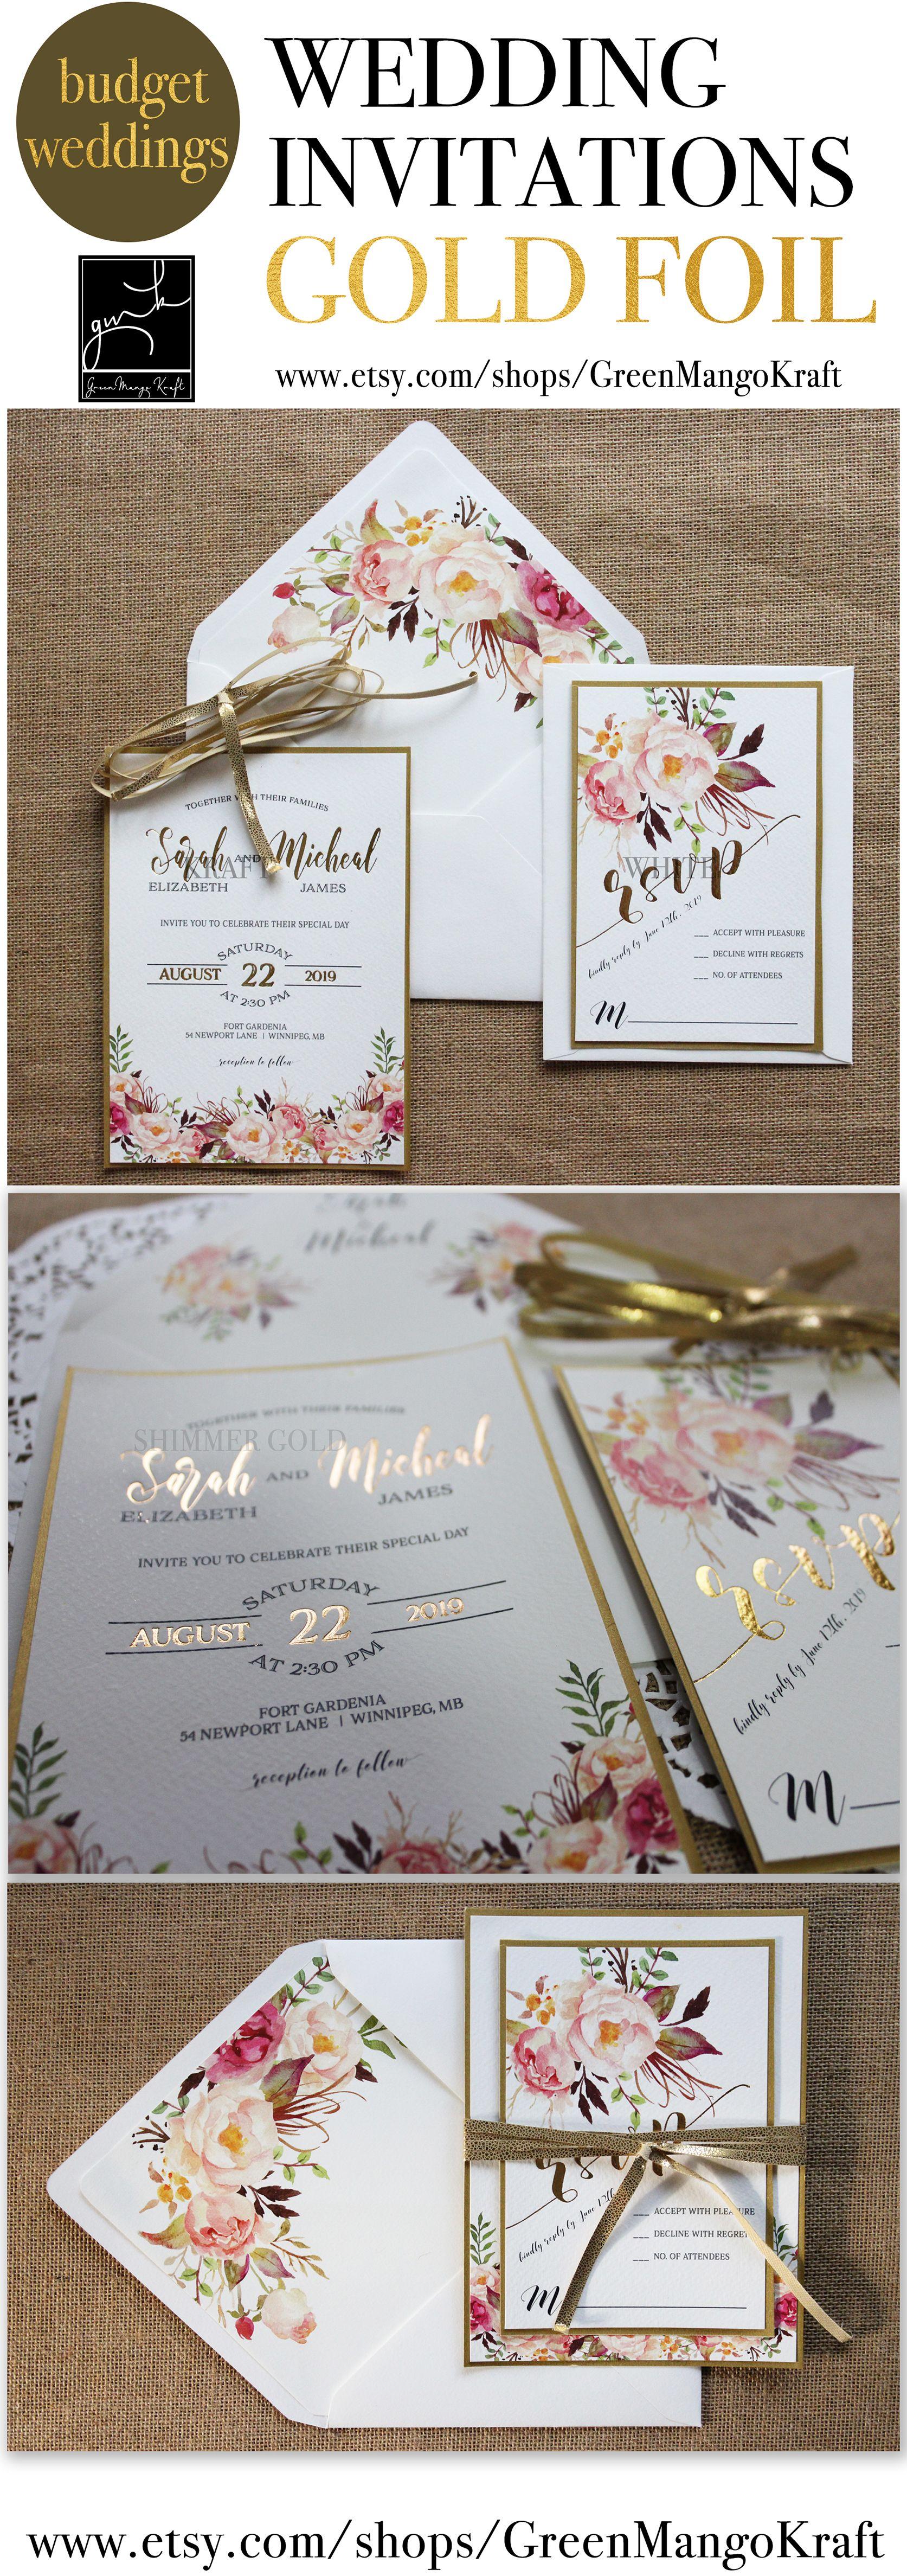 wildflower wedding invitation templates%0A Alabama Map